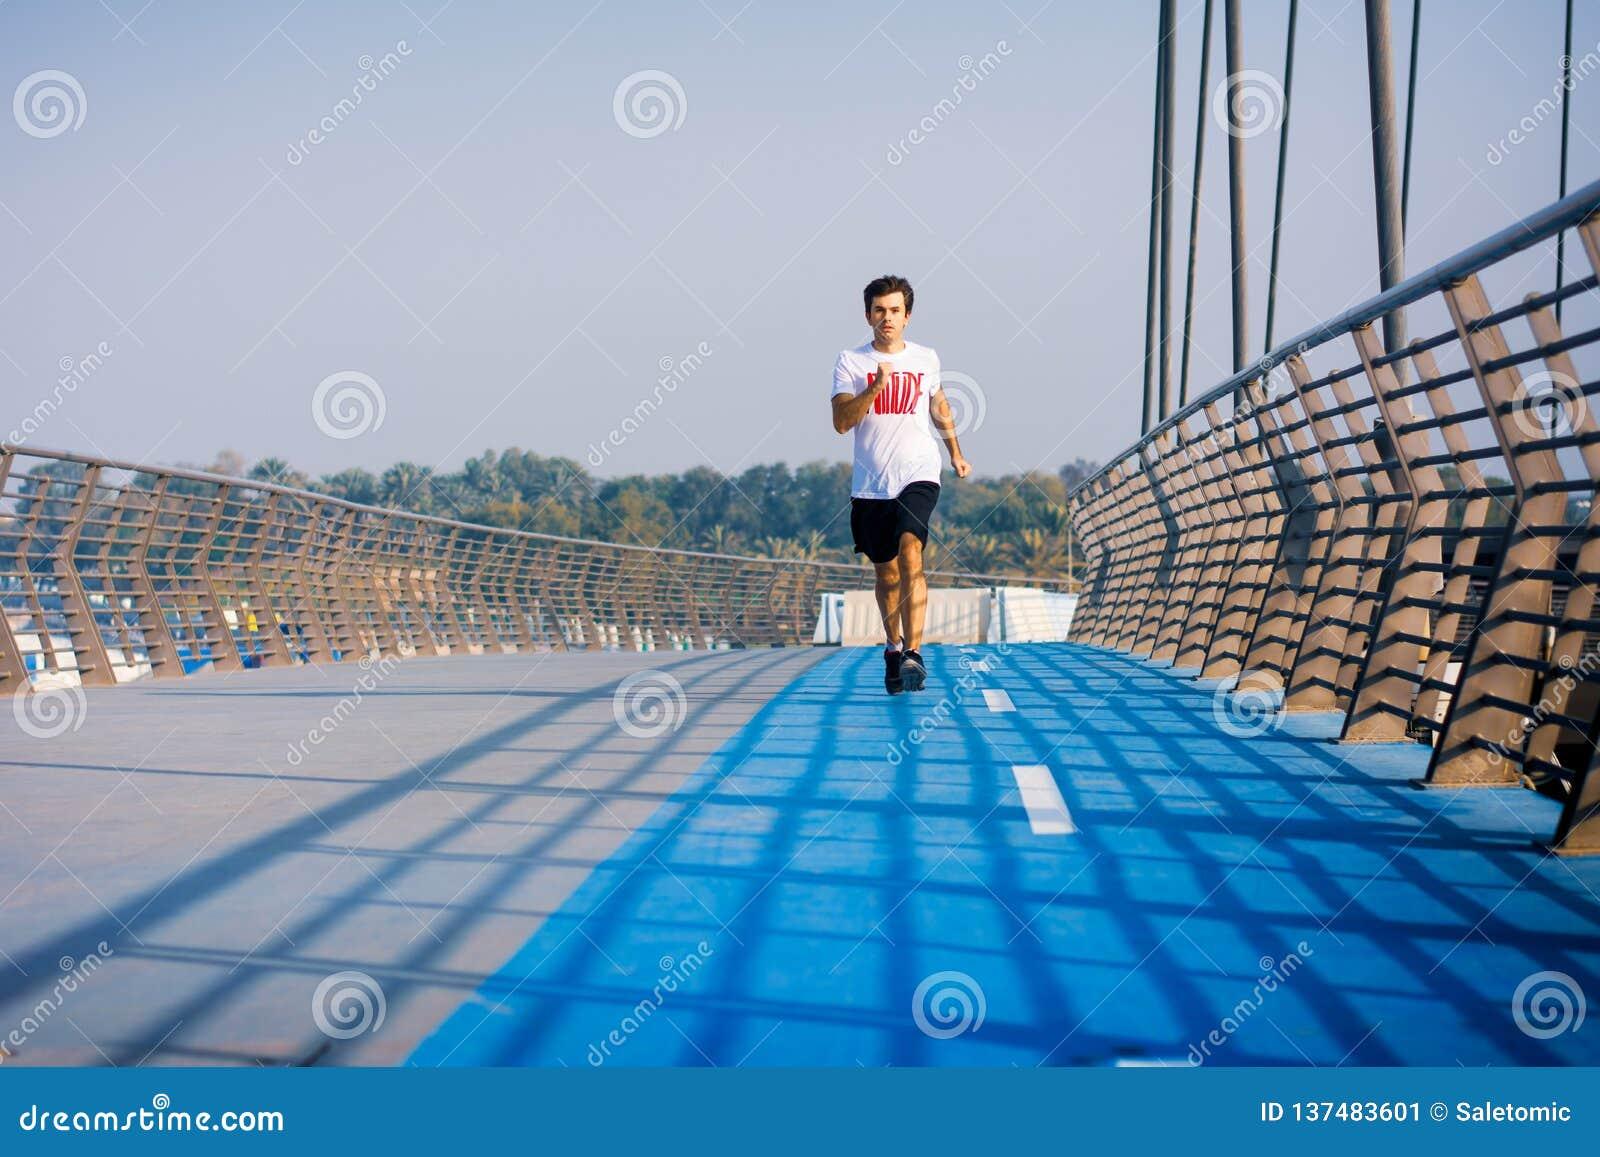 Man running on the bridge on a sunny day